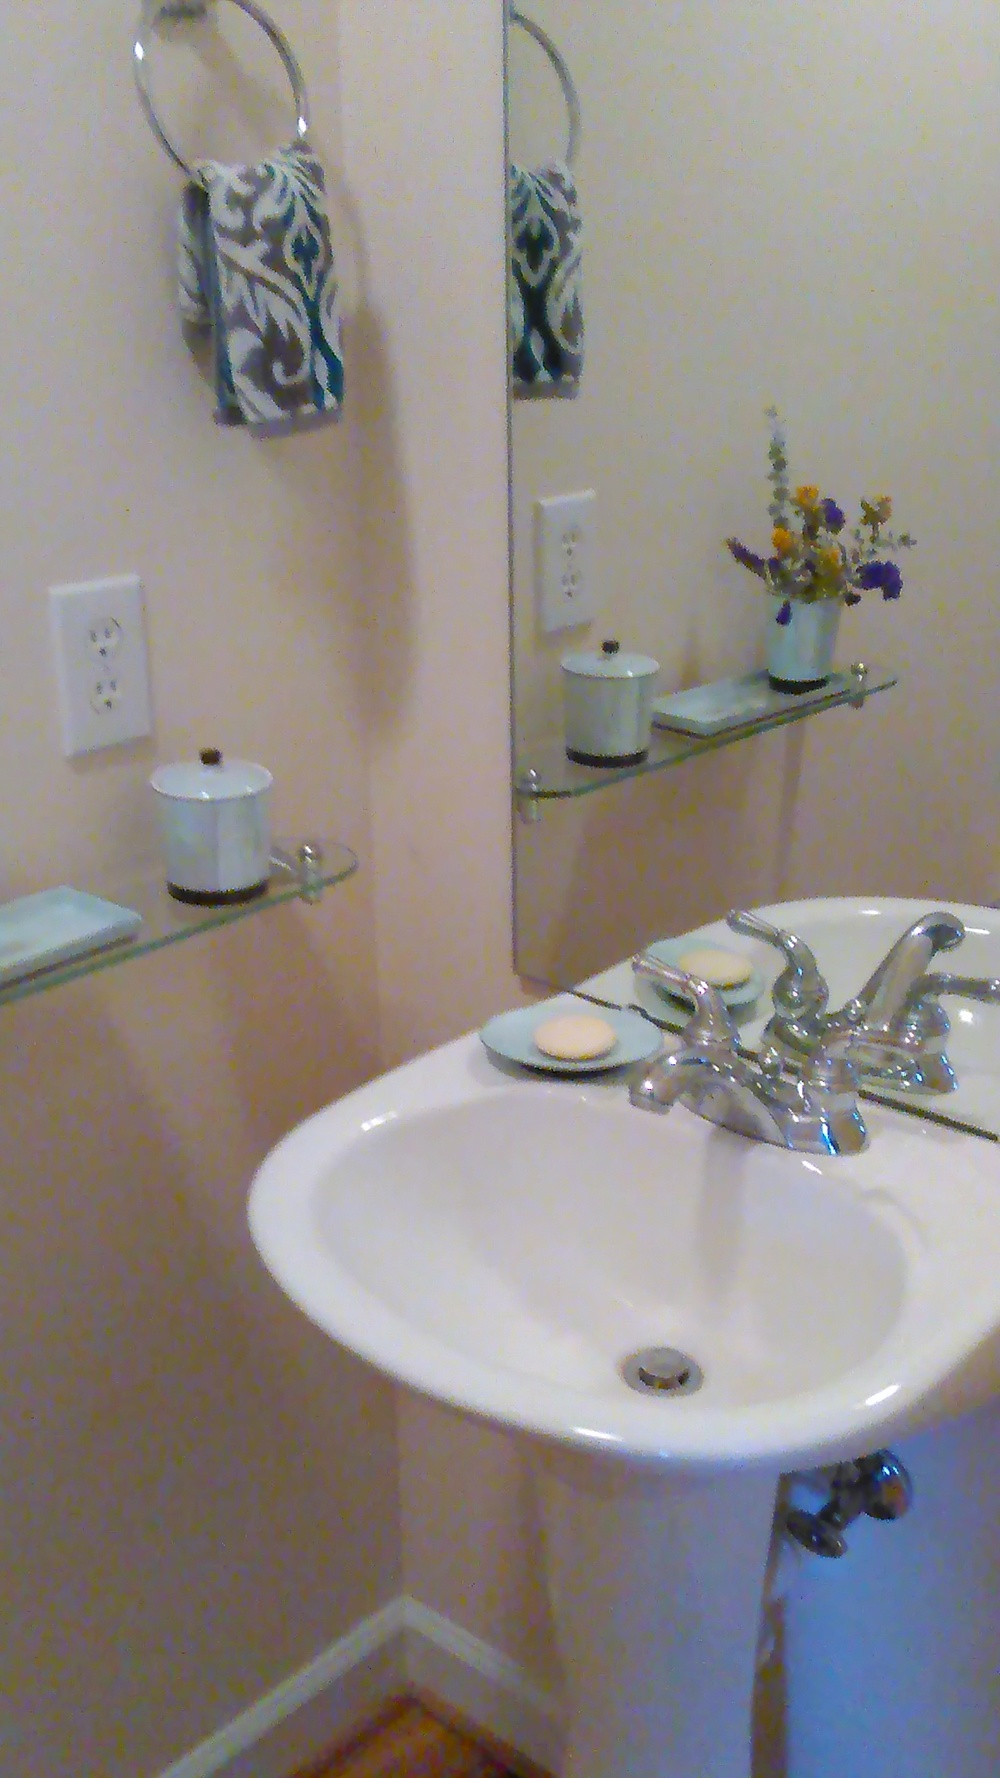 Copperline Drive, 527 - Bathroom II.jpg